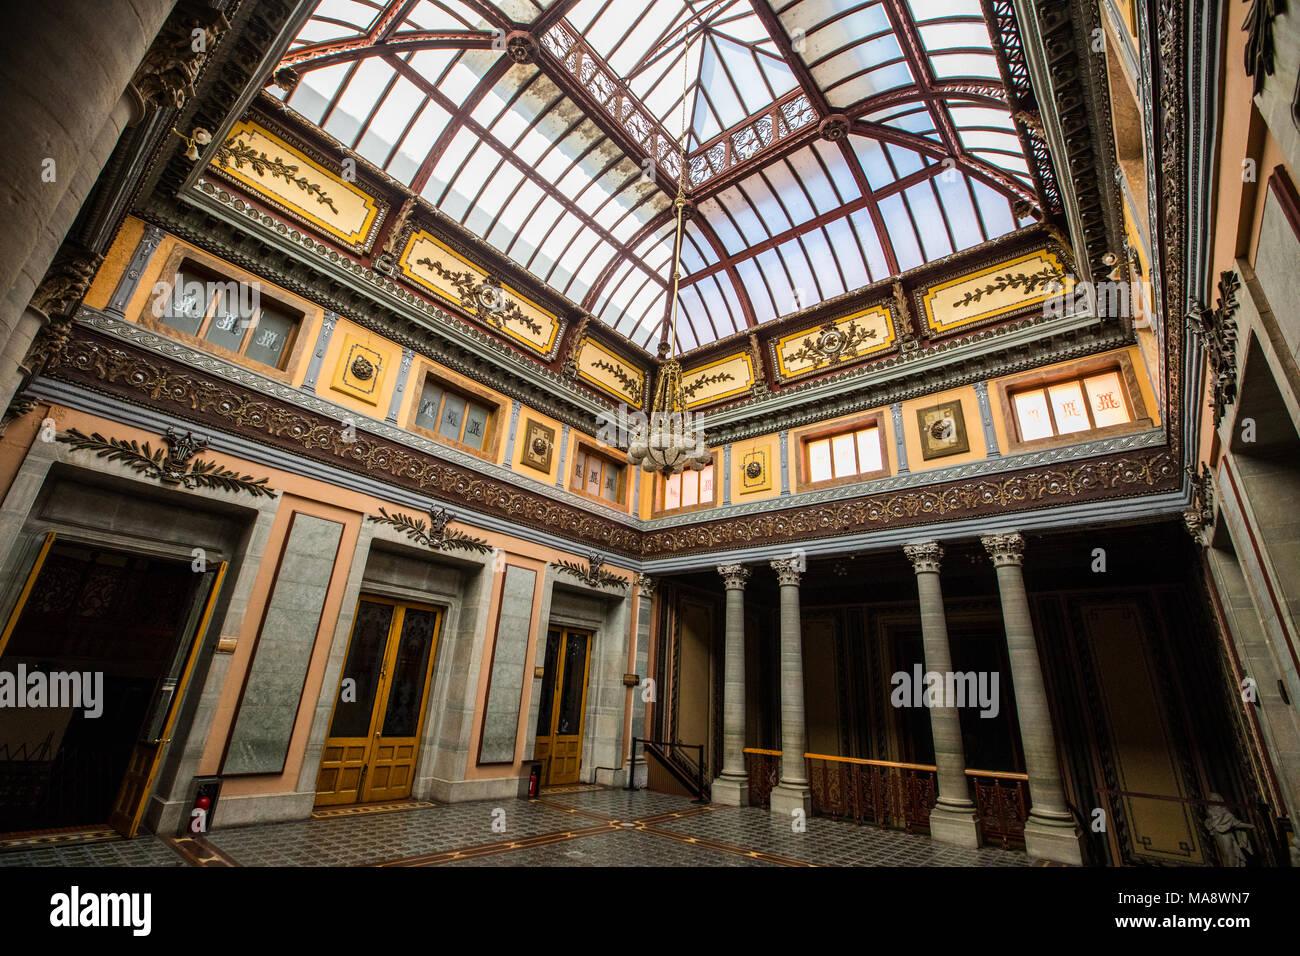 Inside historic Teatro Juarez, Zona Central, Guanajuato, Mexico Stock Photo